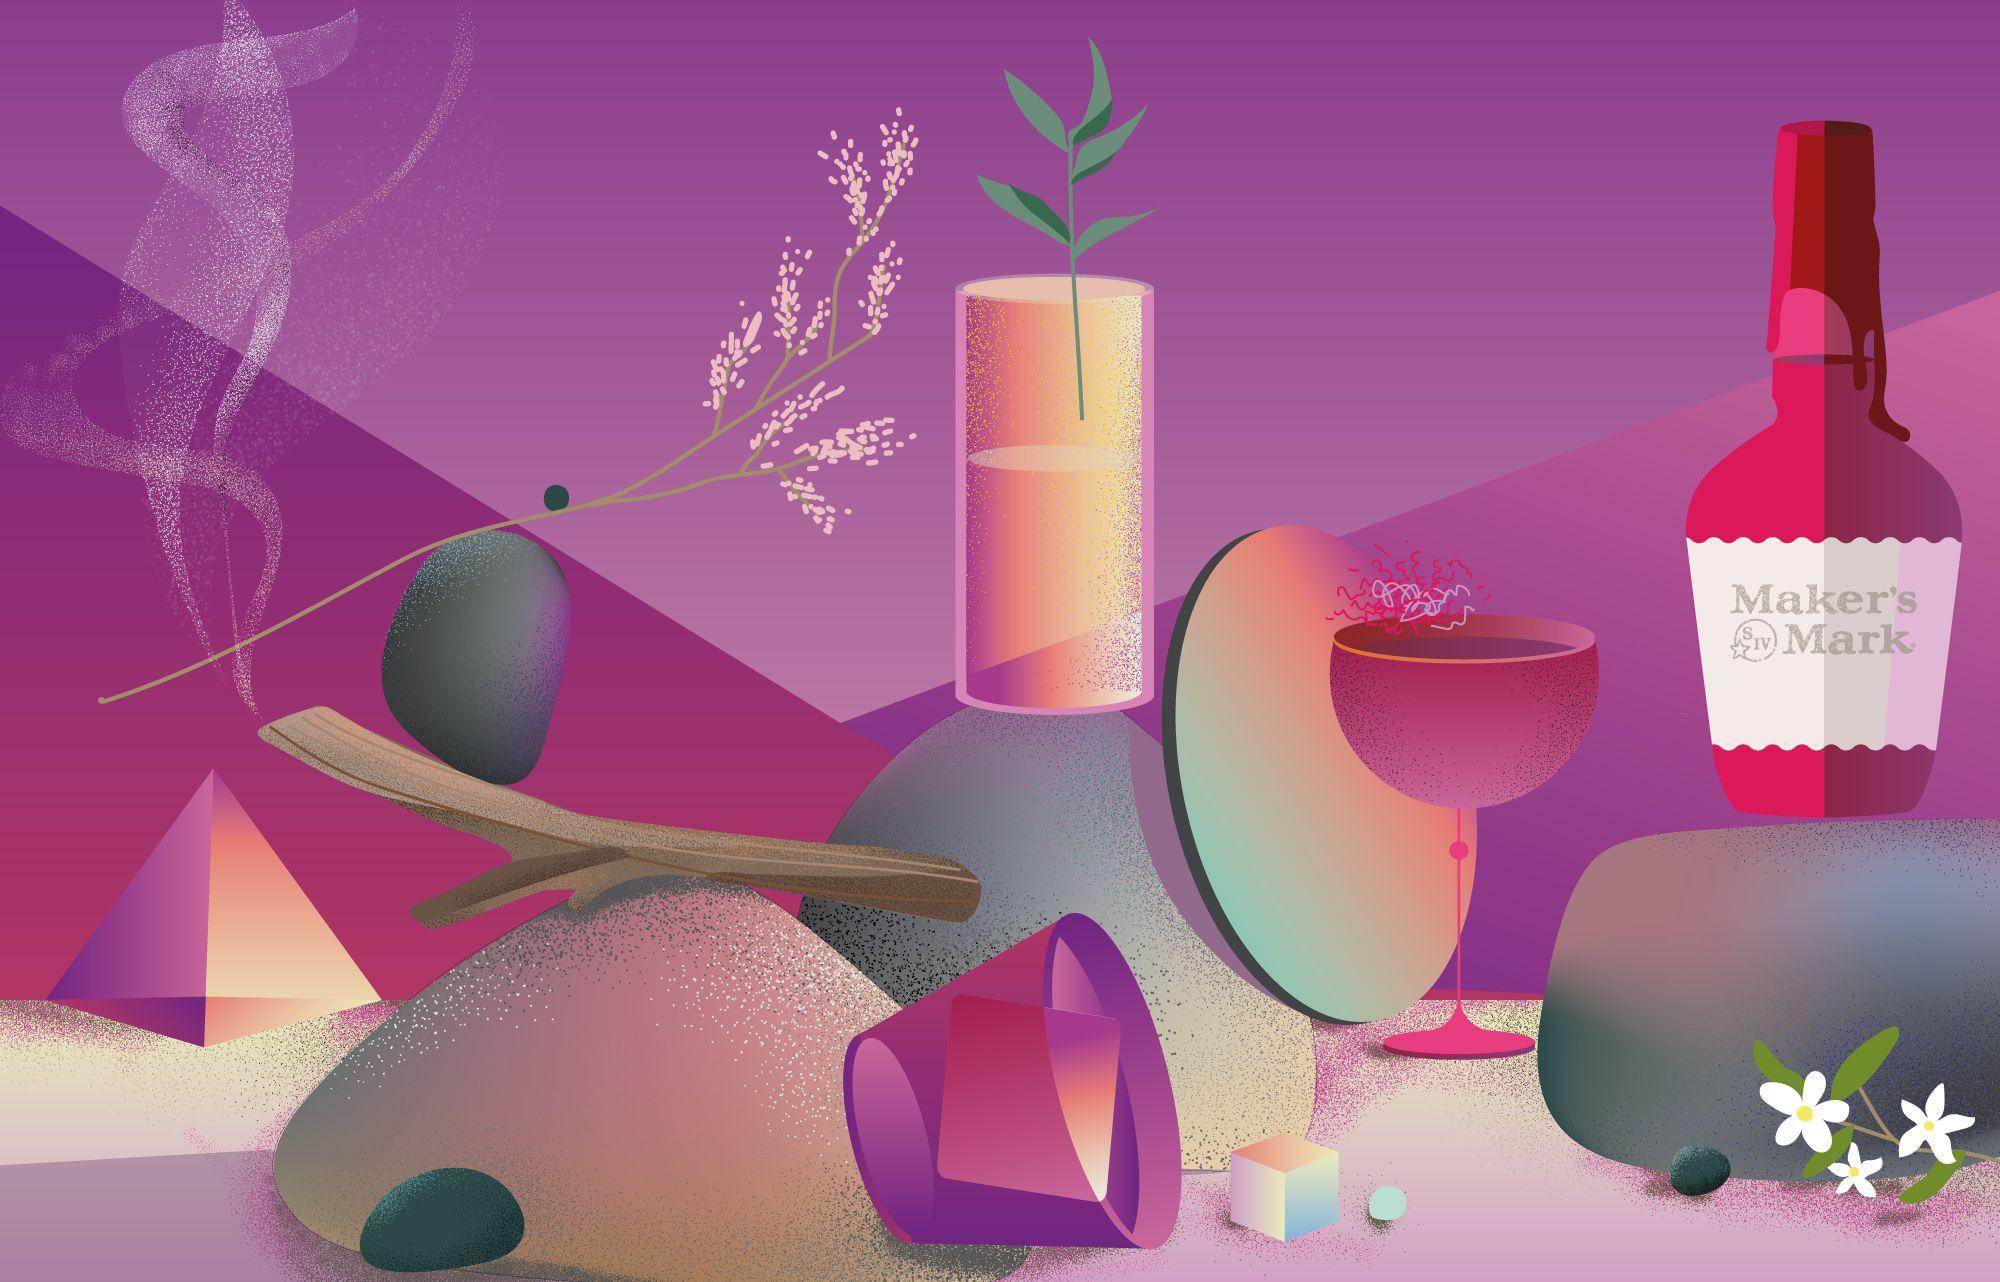 garance-illustration-Irina-Kruglova-MakersMark-poster-spring